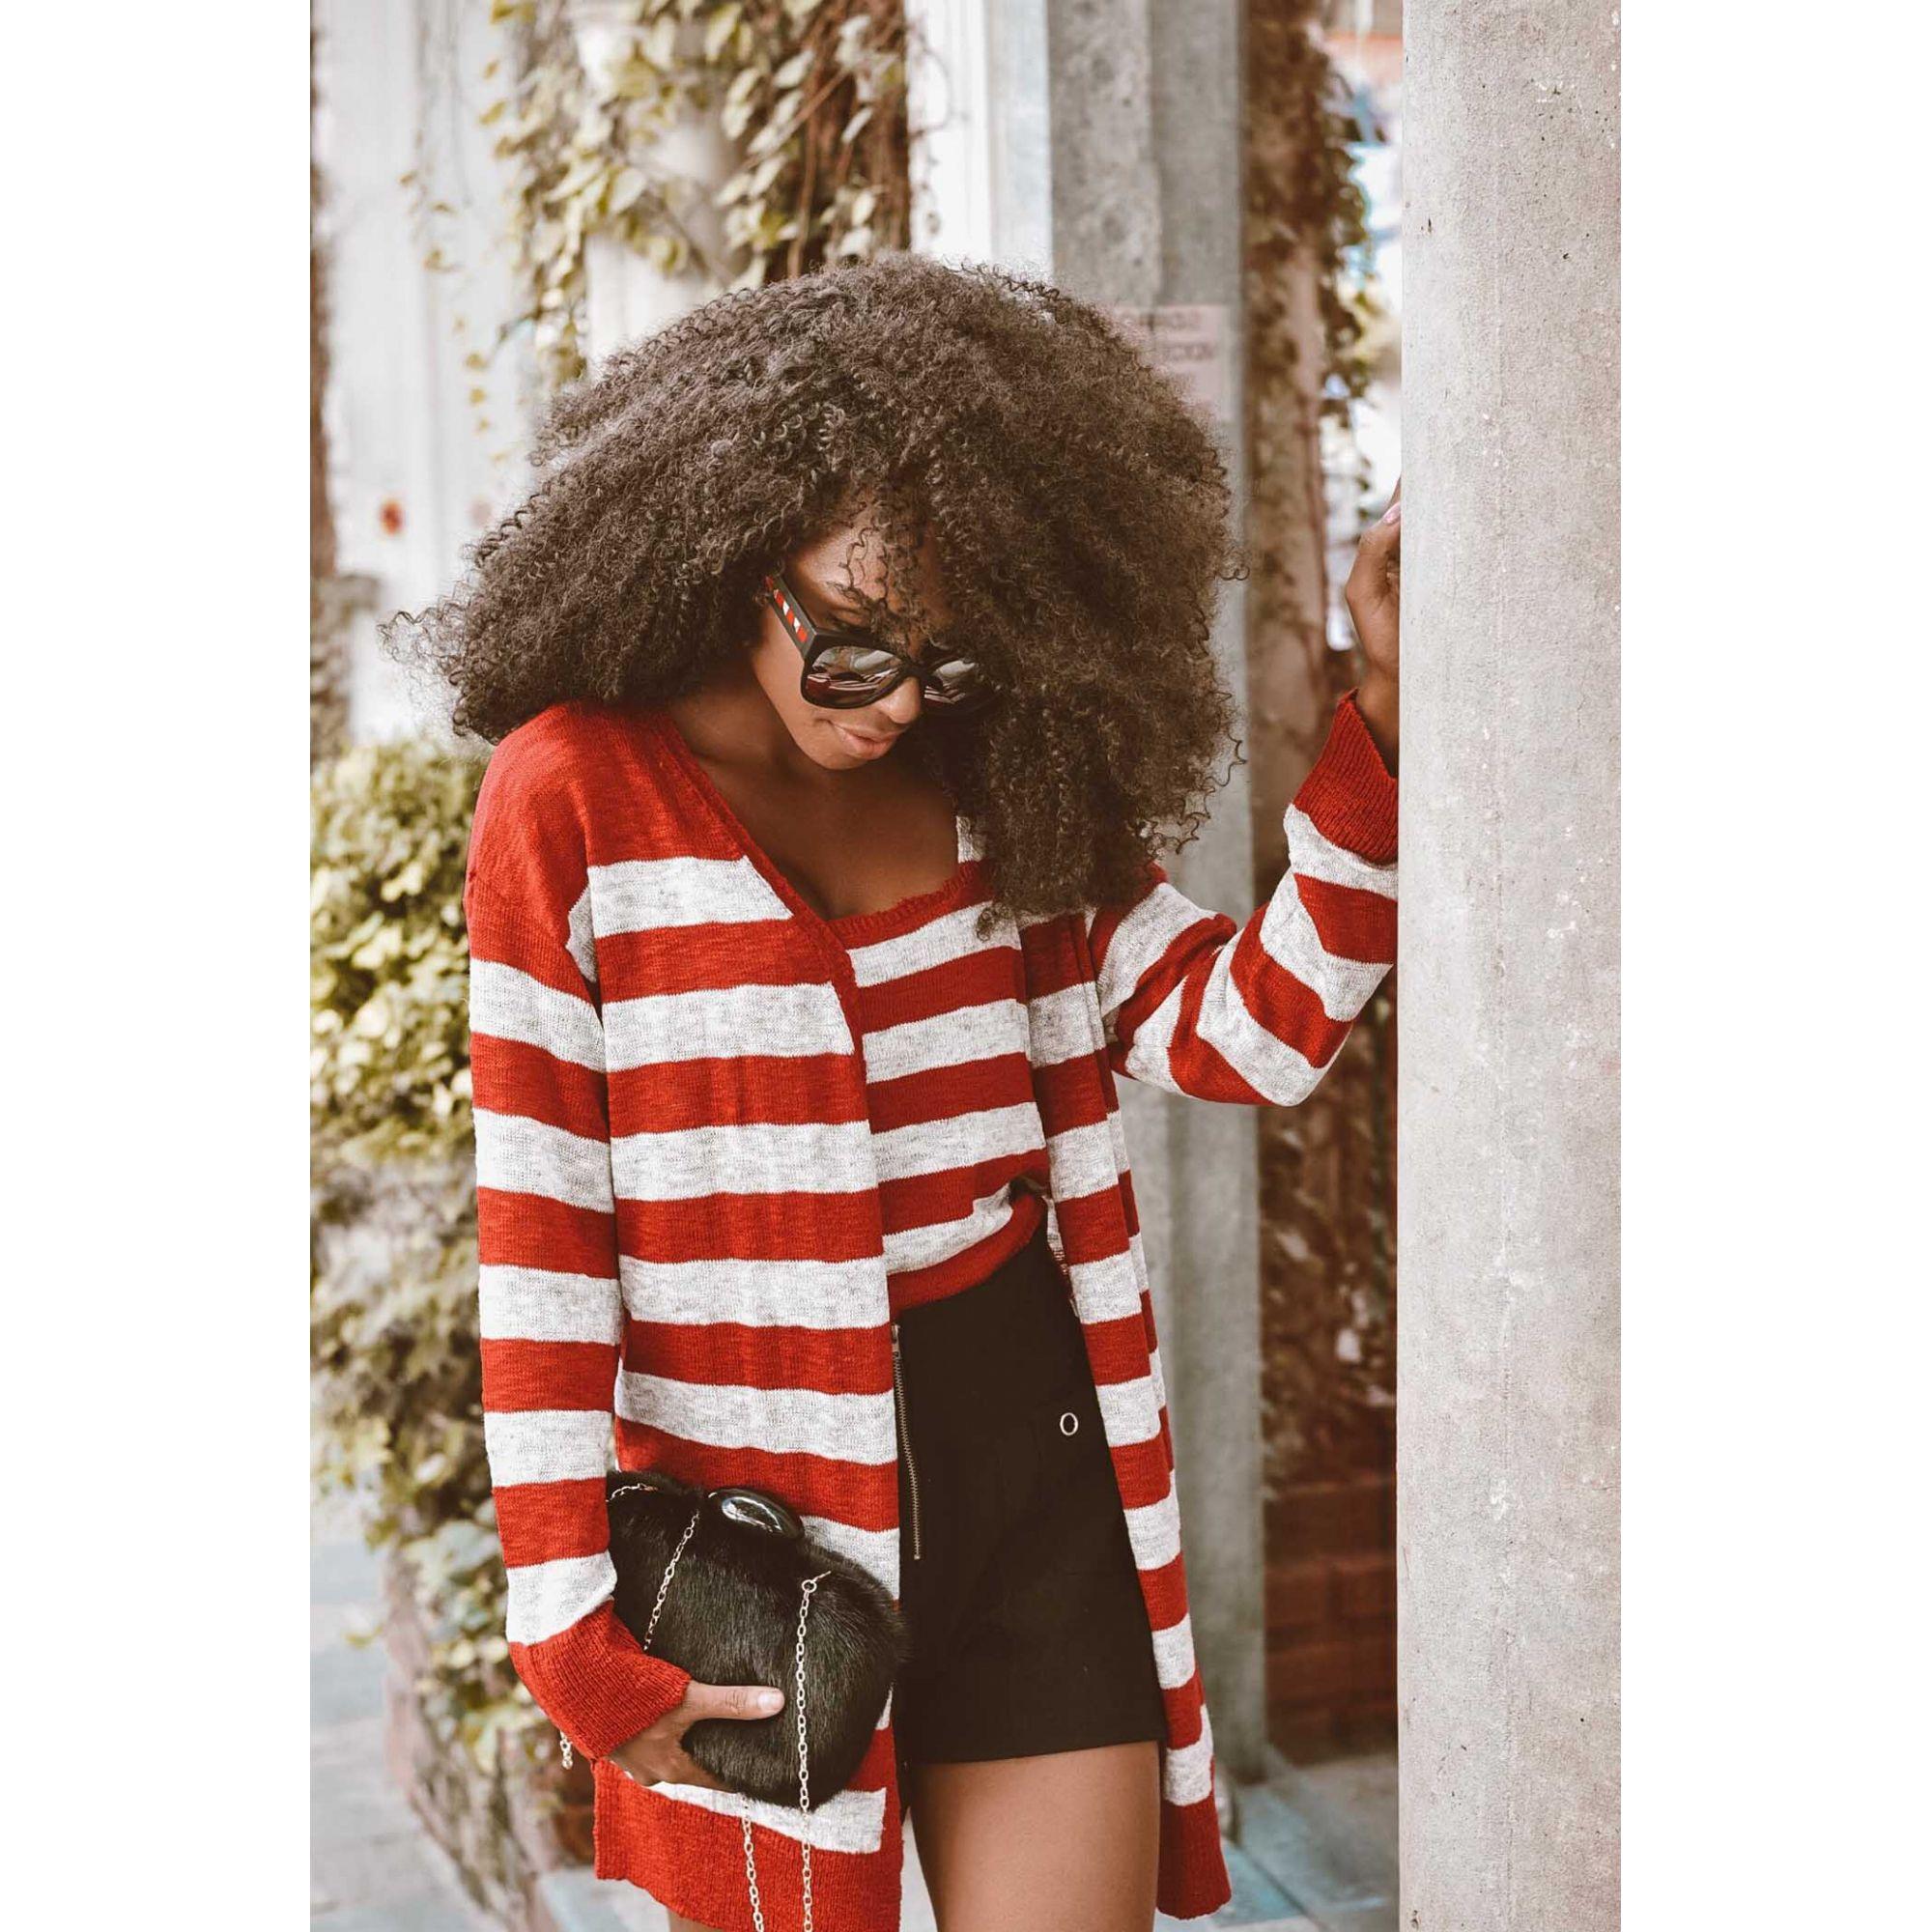 Blusa Regata Listrada Vera Tricot Feminino Vermelho / Off White